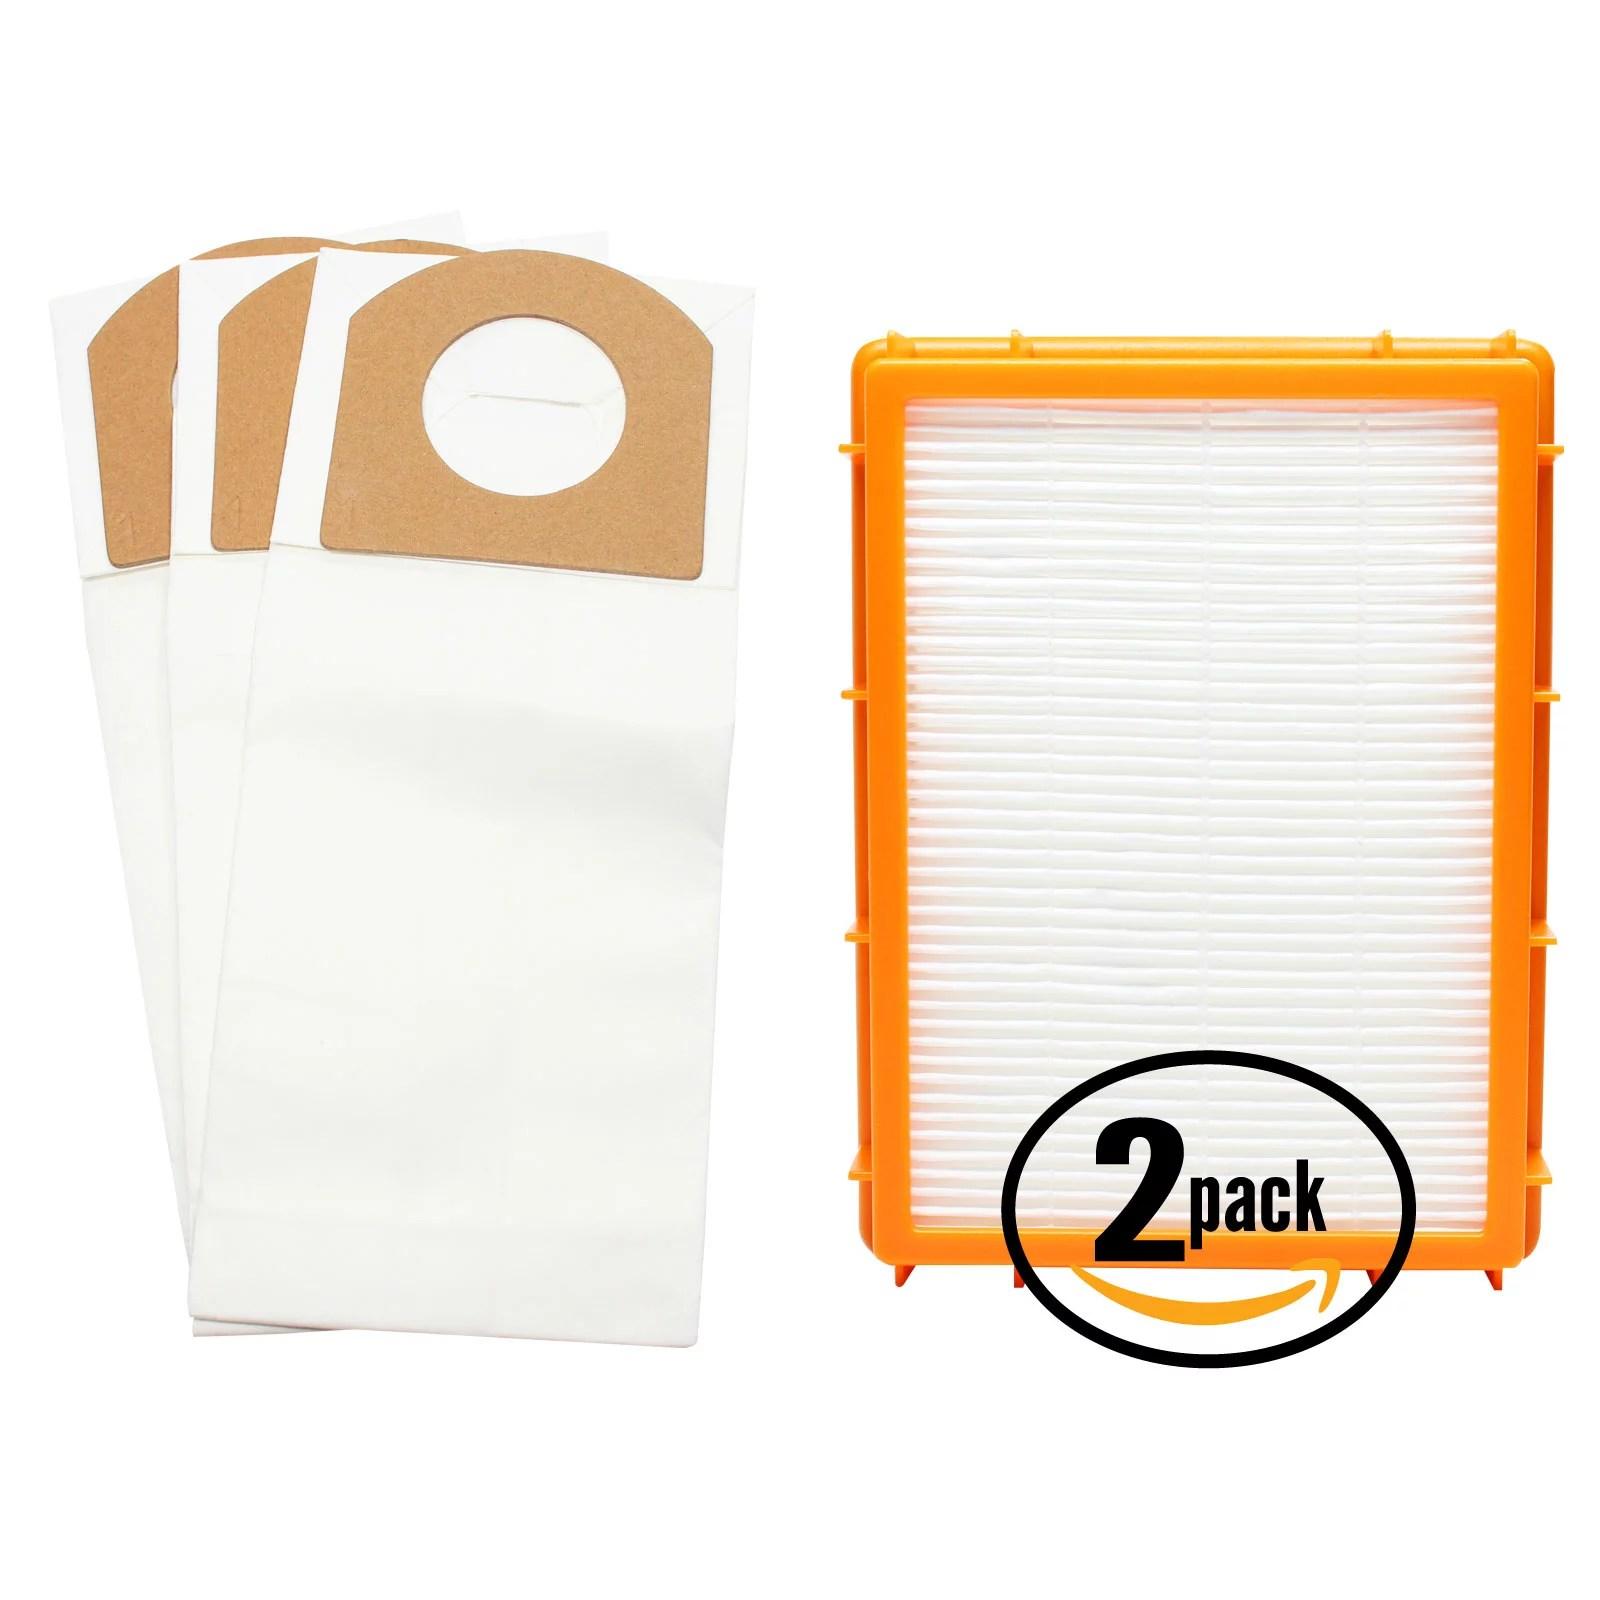 hight resolution of 3 replacement eureka 4870g vacuum bags 2 hepa filter compatible eureka style rr vacuum bags hf 2 filter